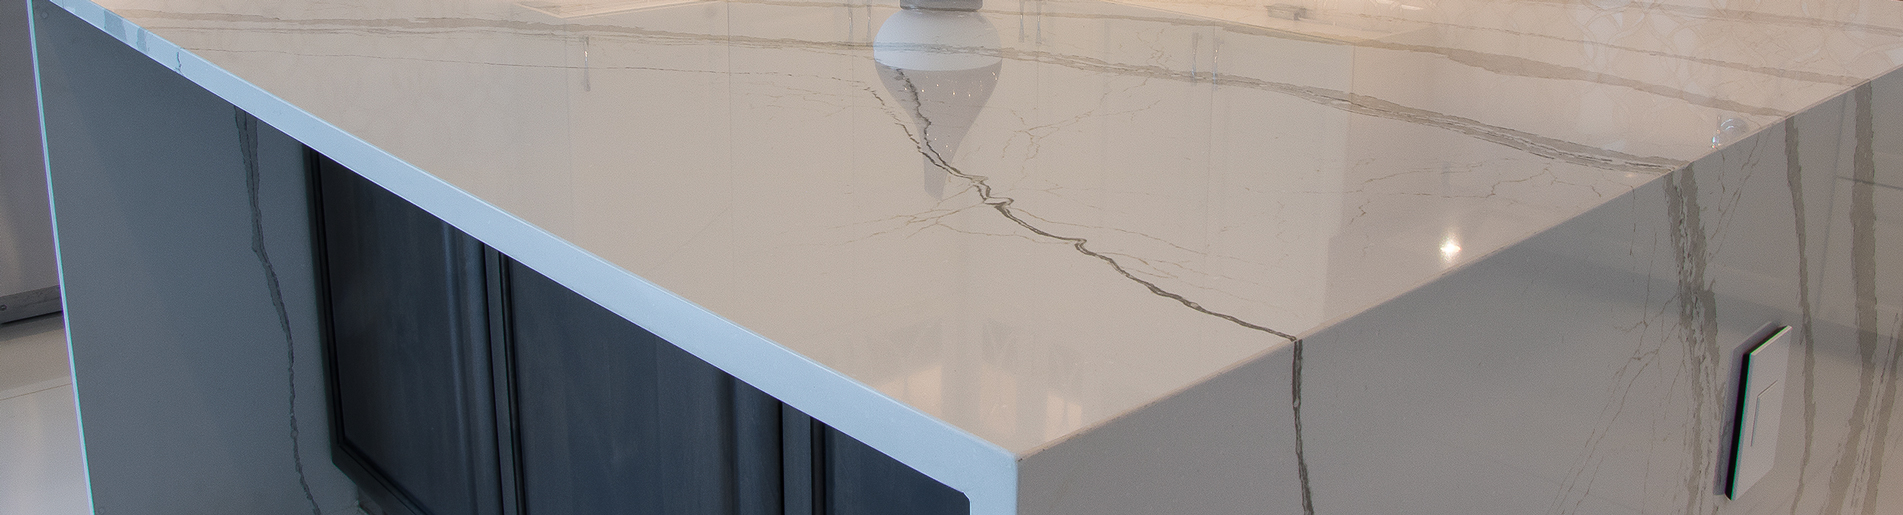 5-sta-granite-bathroom-cambria-c6